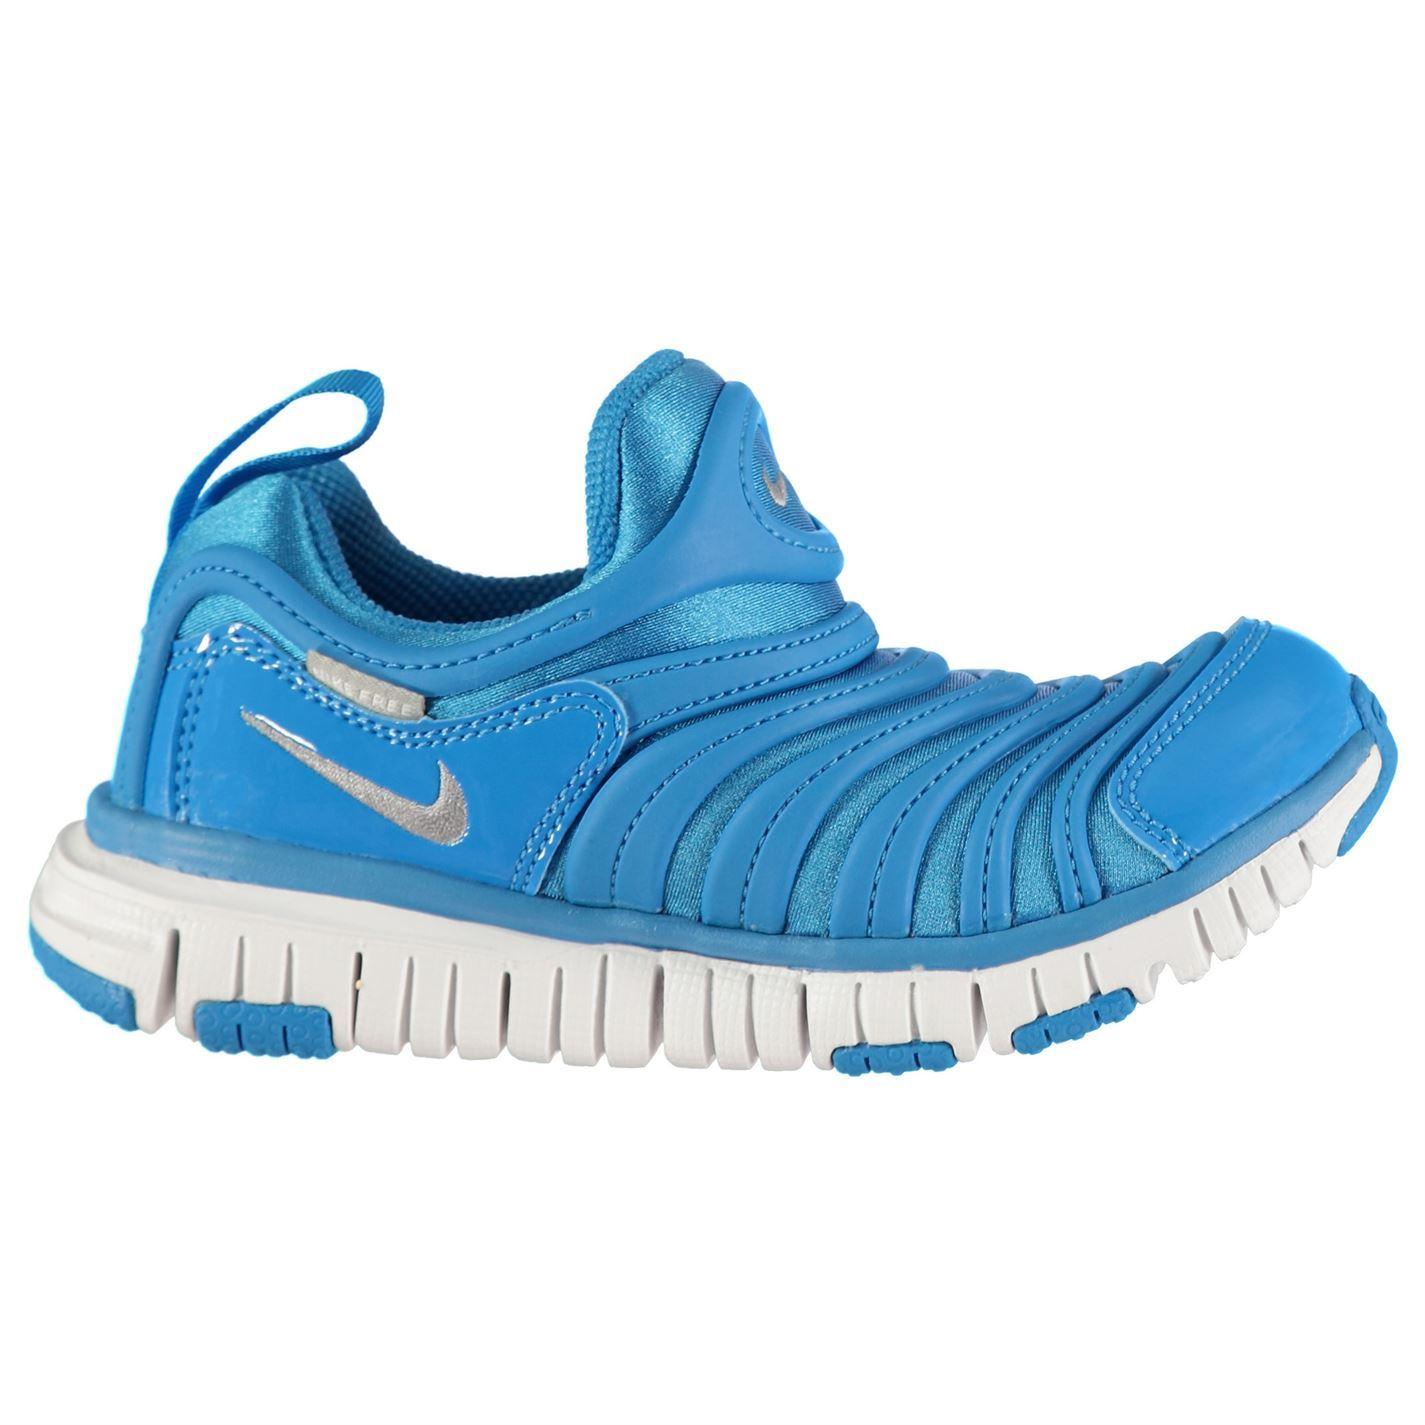 b7542299f64d61 ... Nike Dynamo Free Child Boys Trainers Shoes Footwear